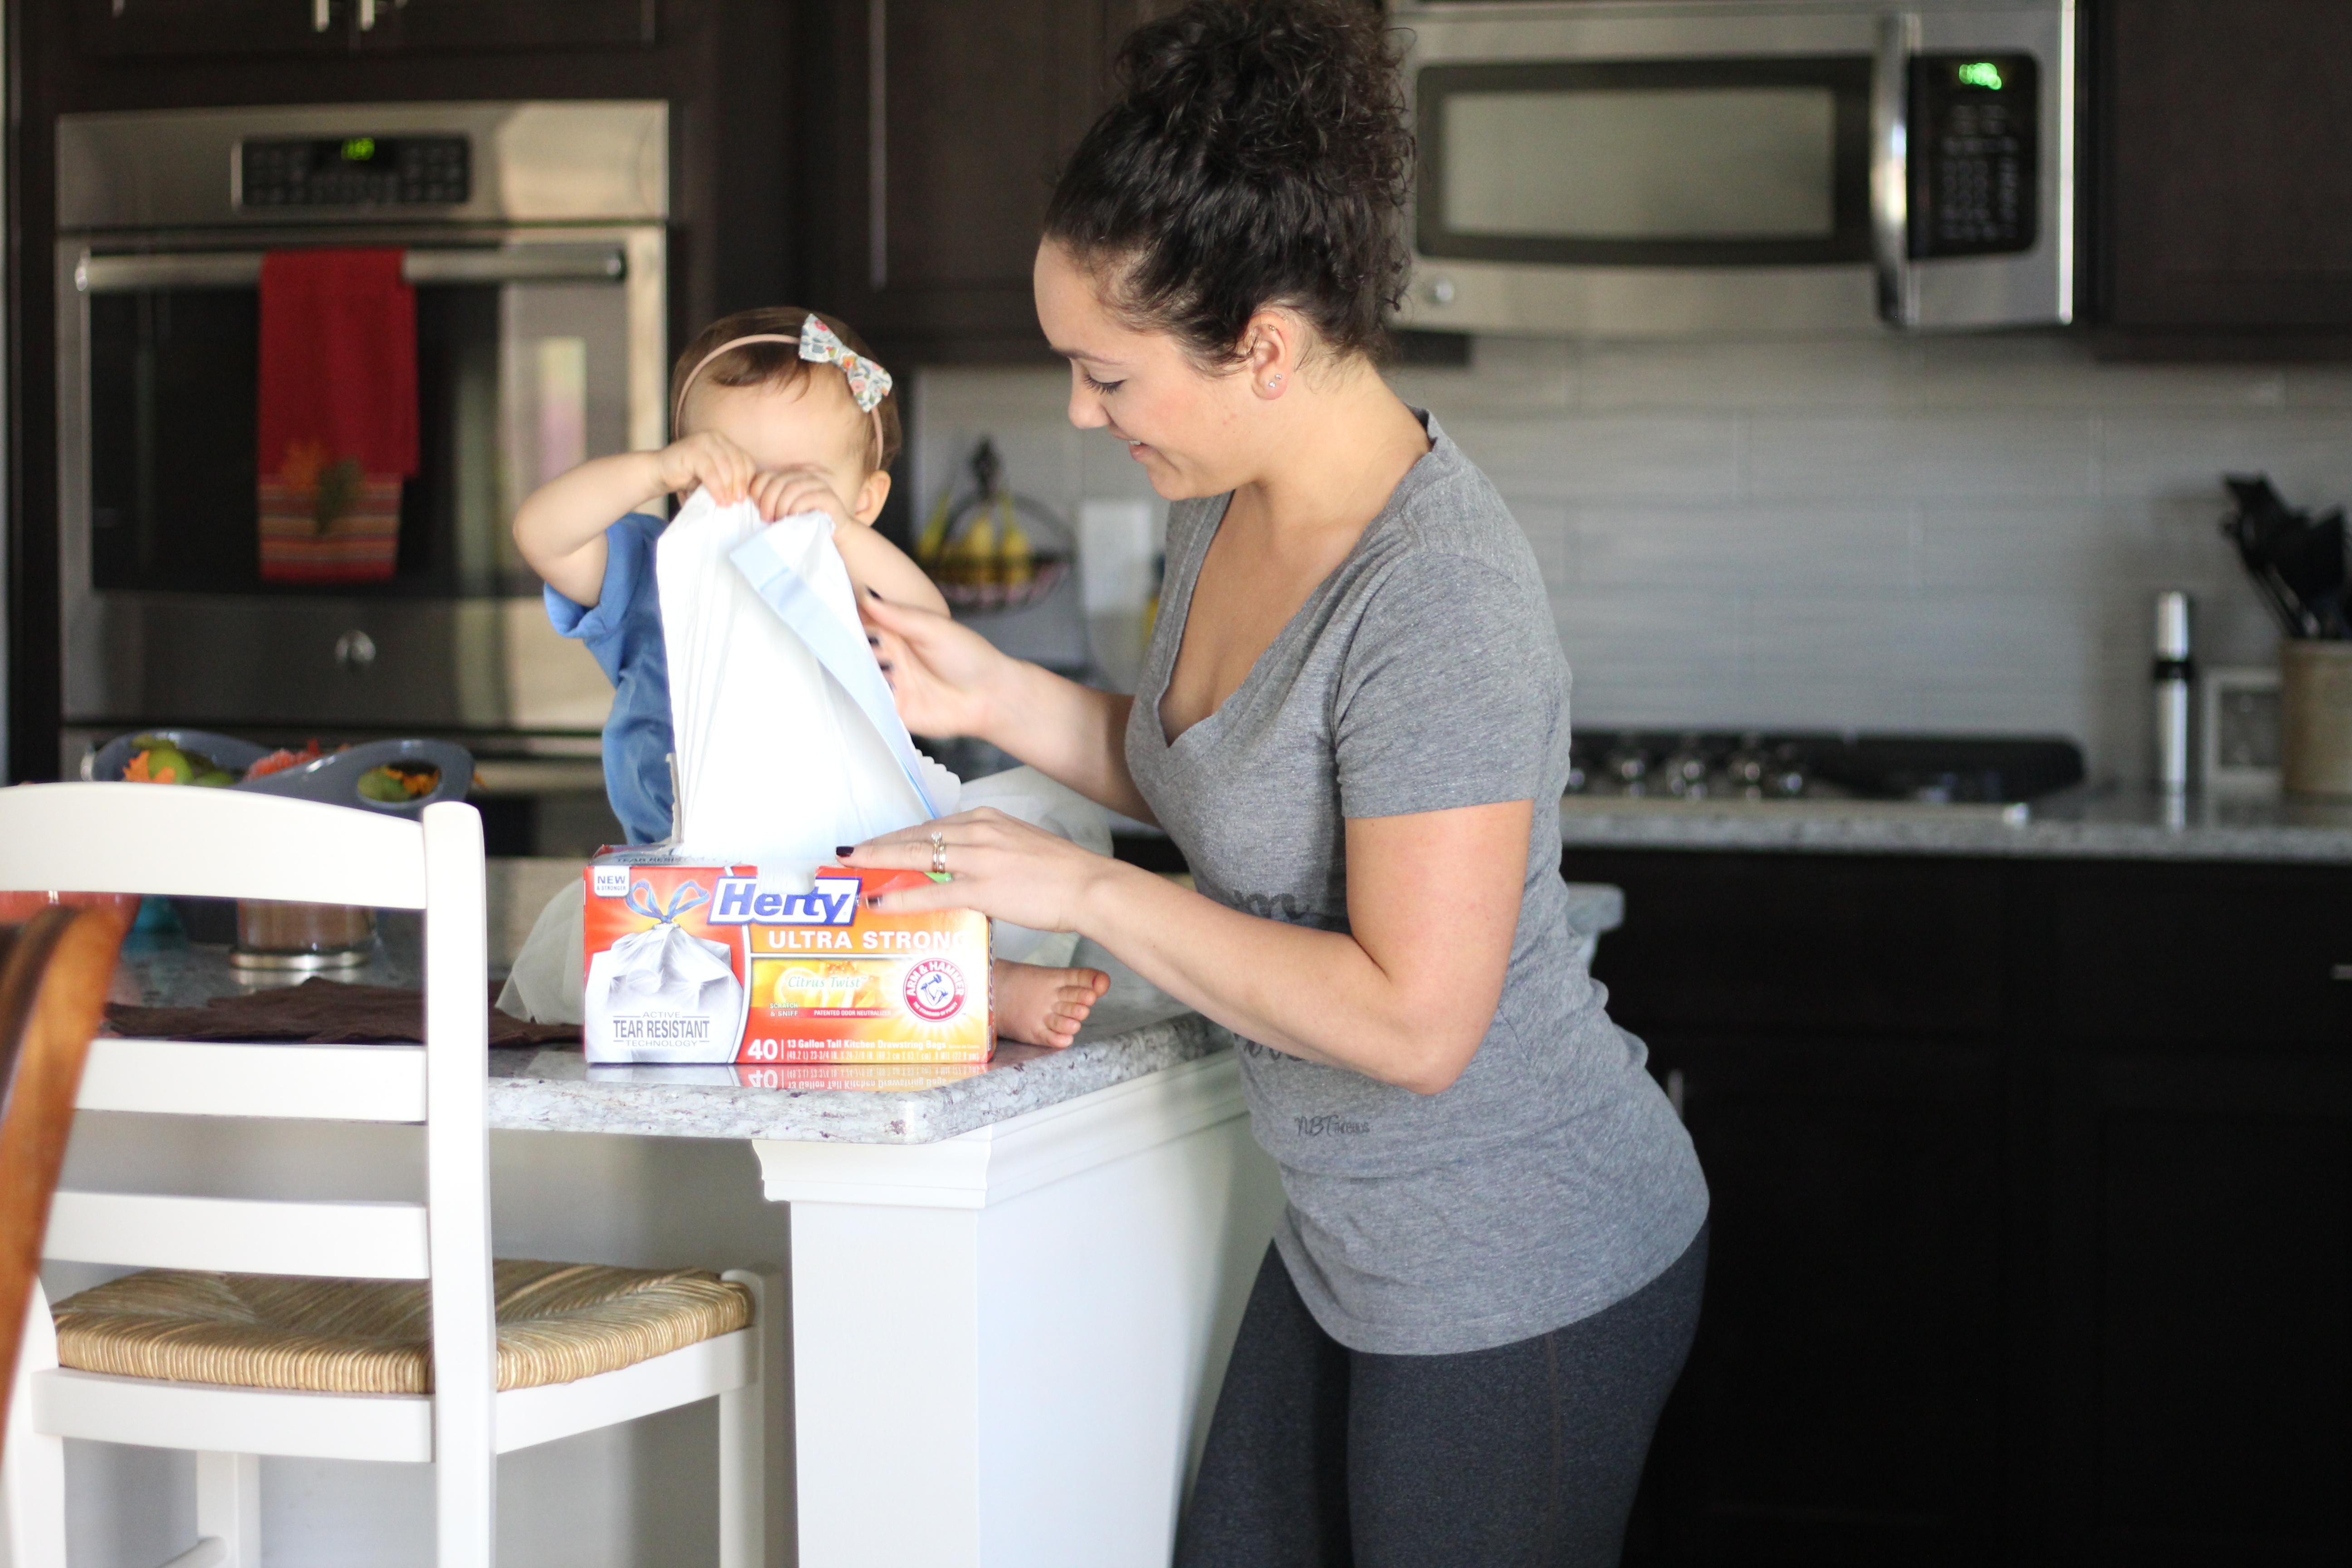 My Ugly Truths Of Motherhood- Bring on HEFTY help